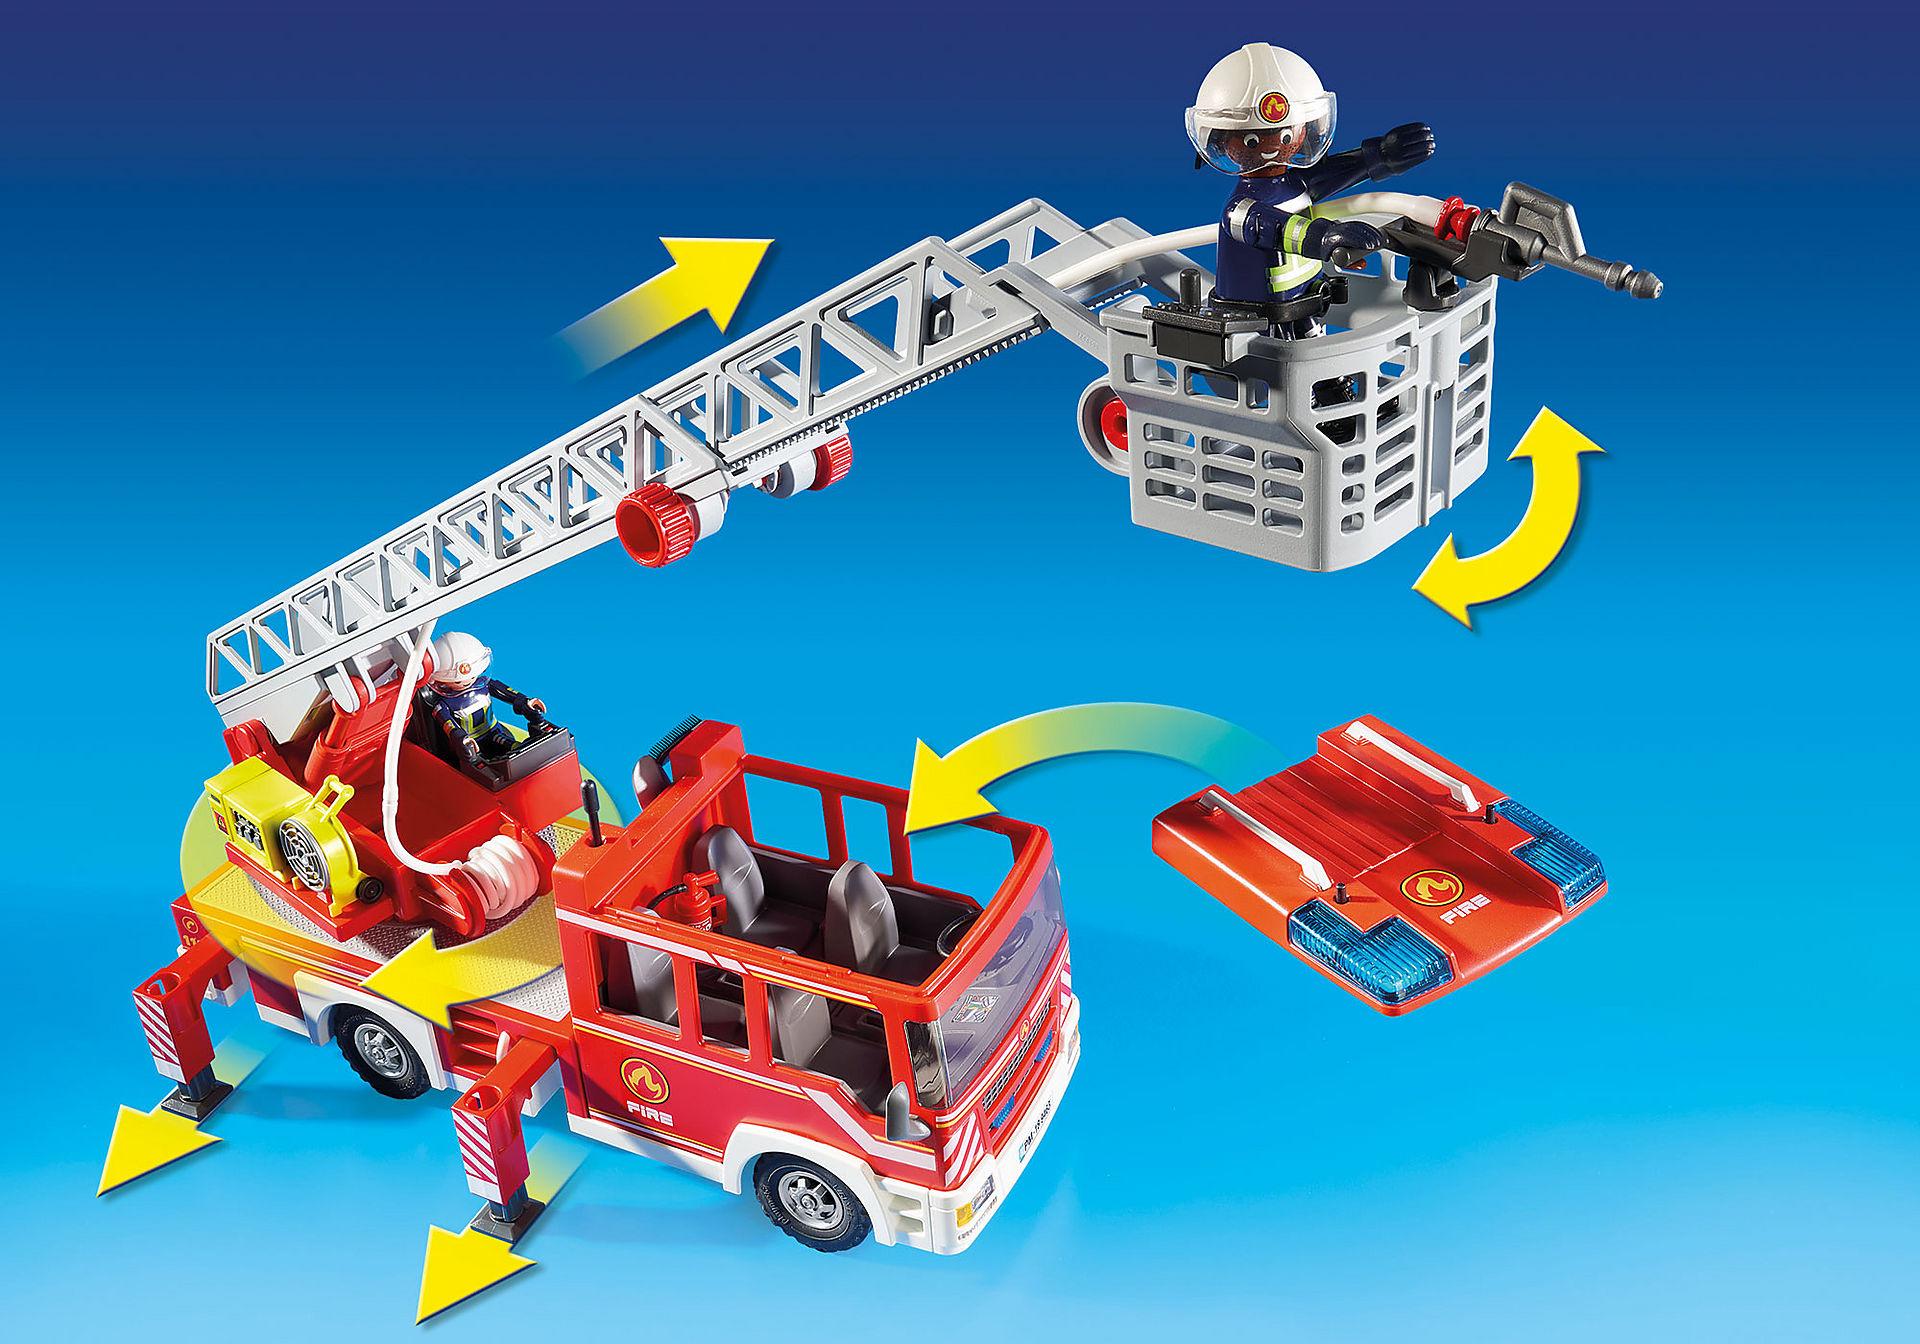 http://media.playmobil.com/i/playmobil/9463_product_extra3/Όχημα Πυροσβεστικής με σκάλα και καλάθι διάσωσης